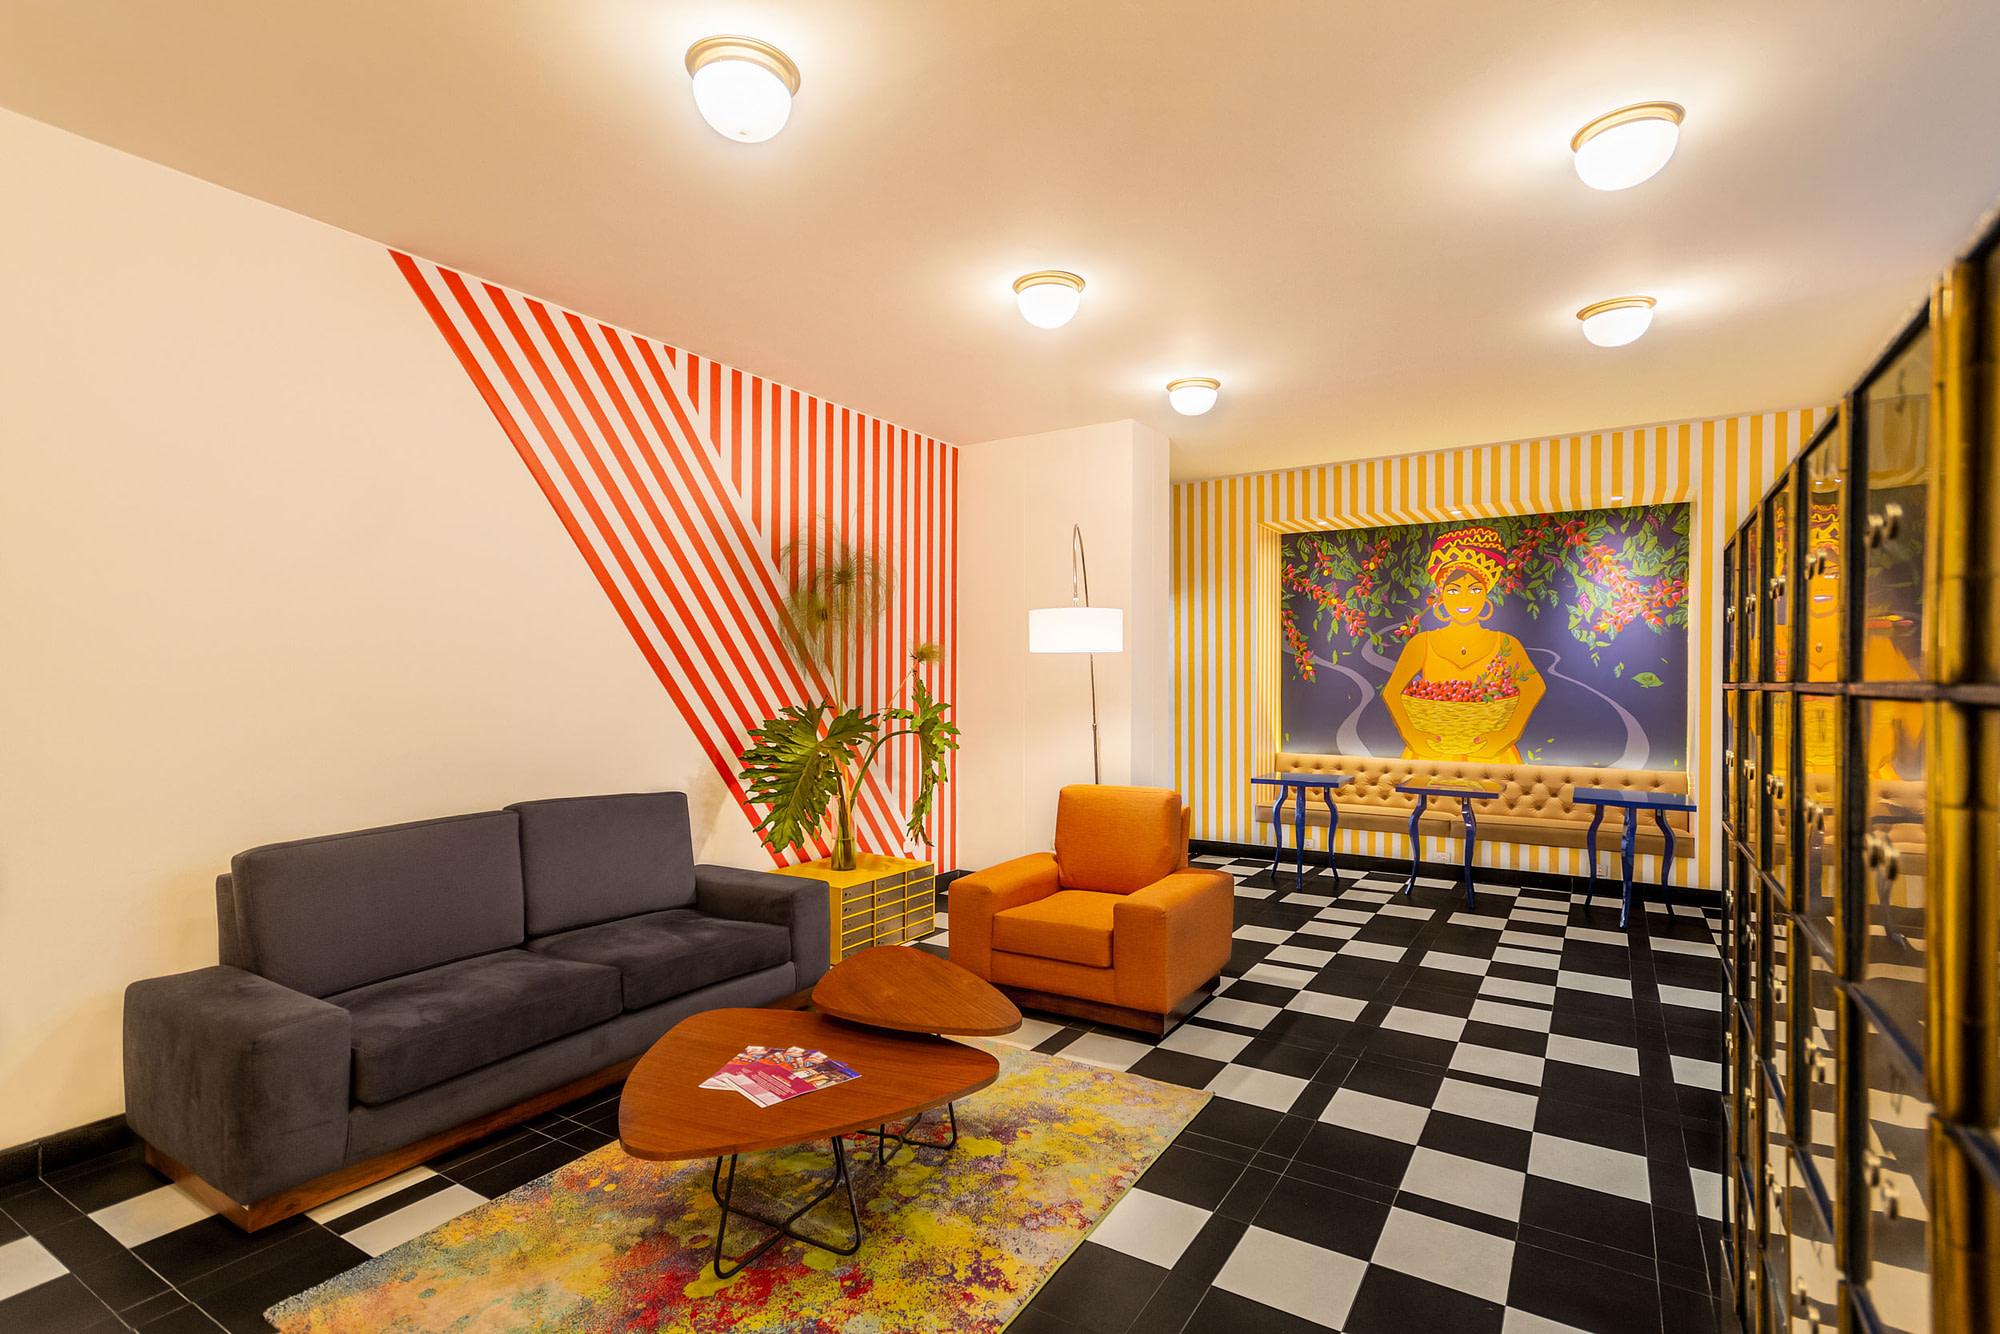 Hotel Pop Art